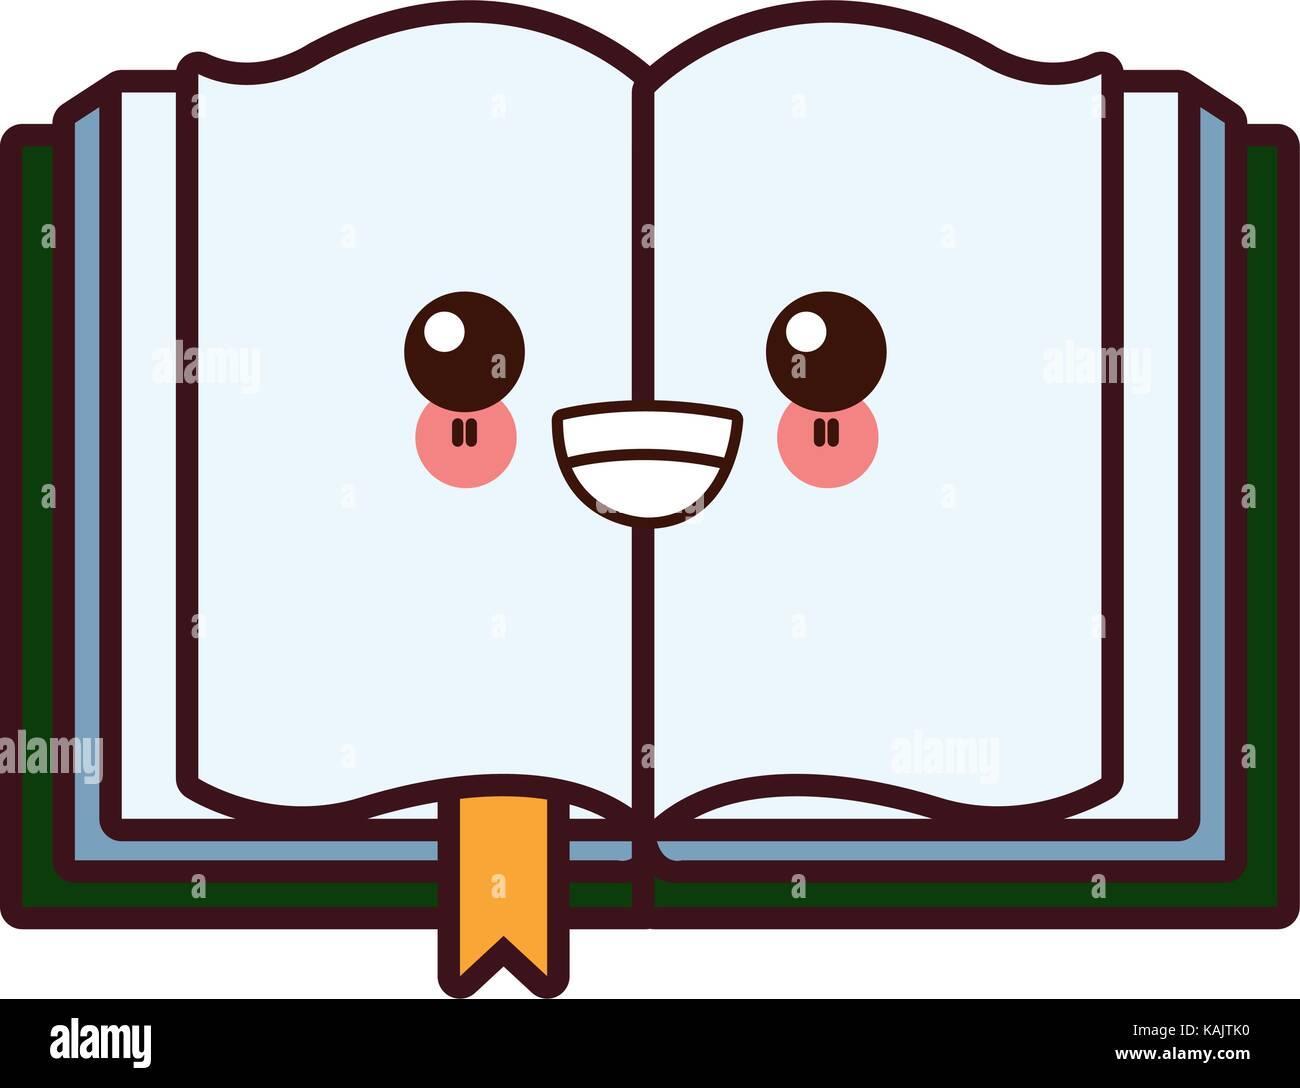 Symbole Ouvert Livre Kawaii Cartoon Vecteurs Et Illustration